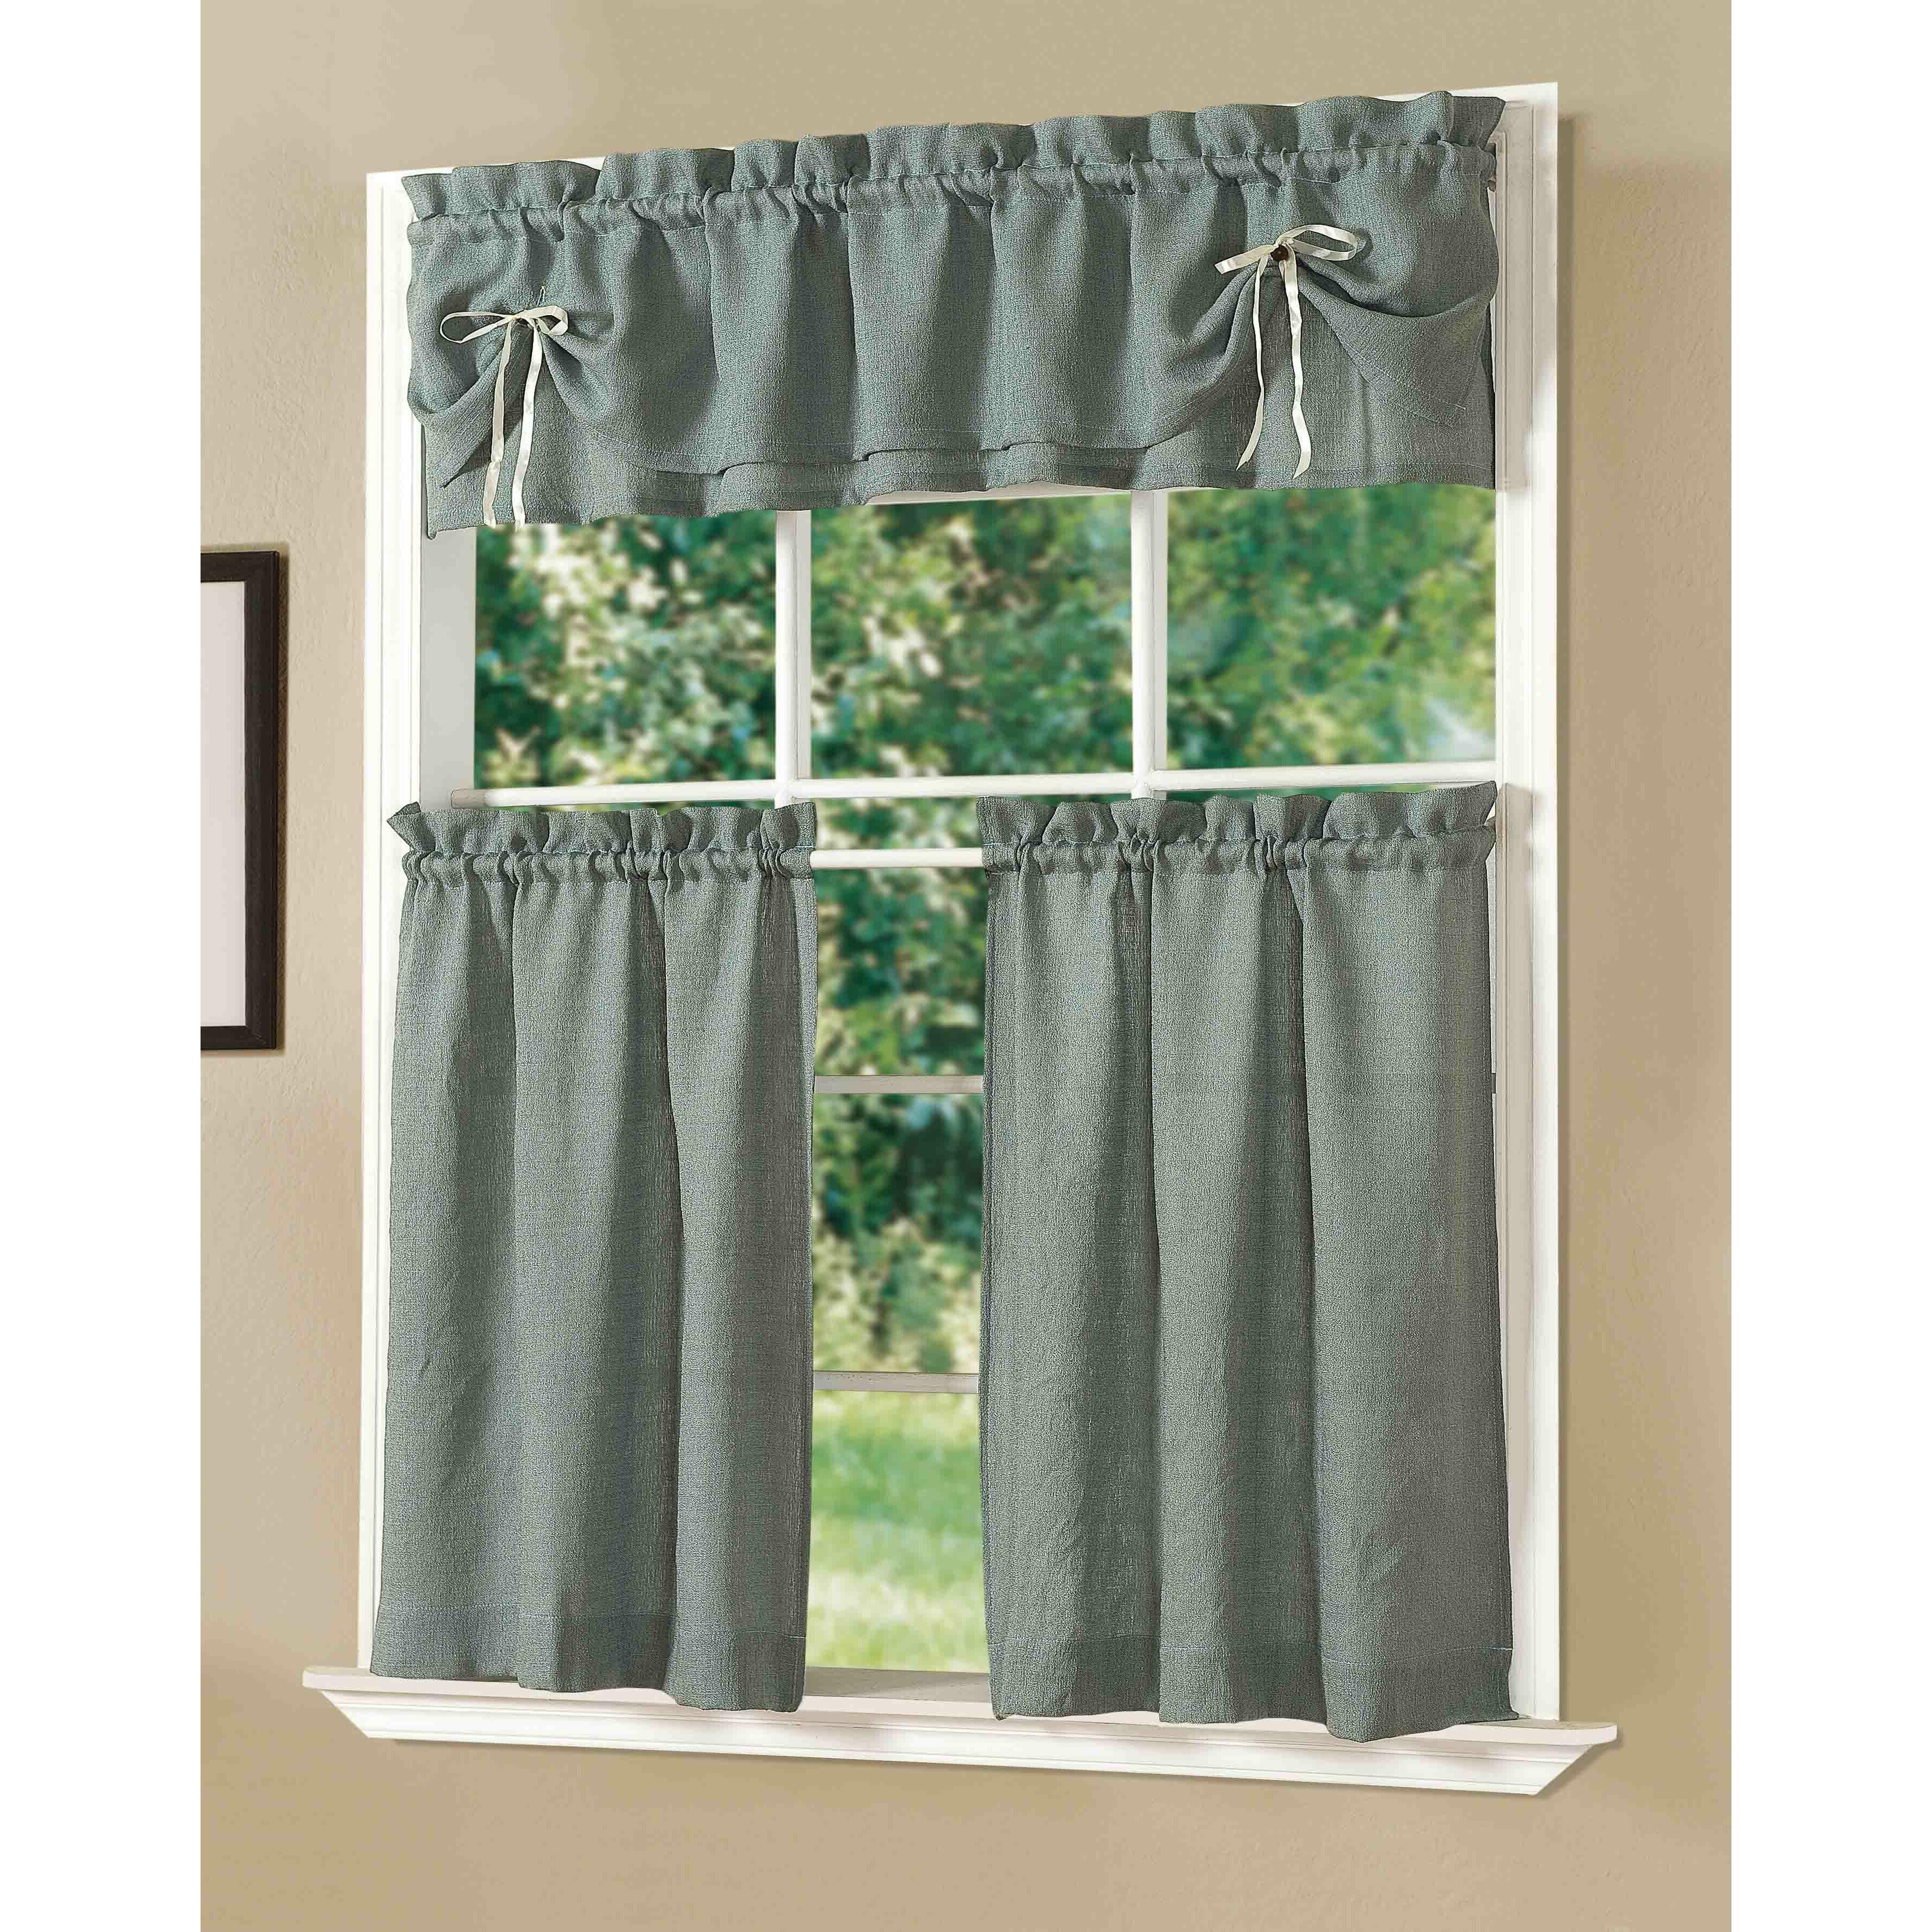 Kitchen Curtain Sets Clearance Kitchen Curtain Sets Clearance Sensational Indigo Comforter Set